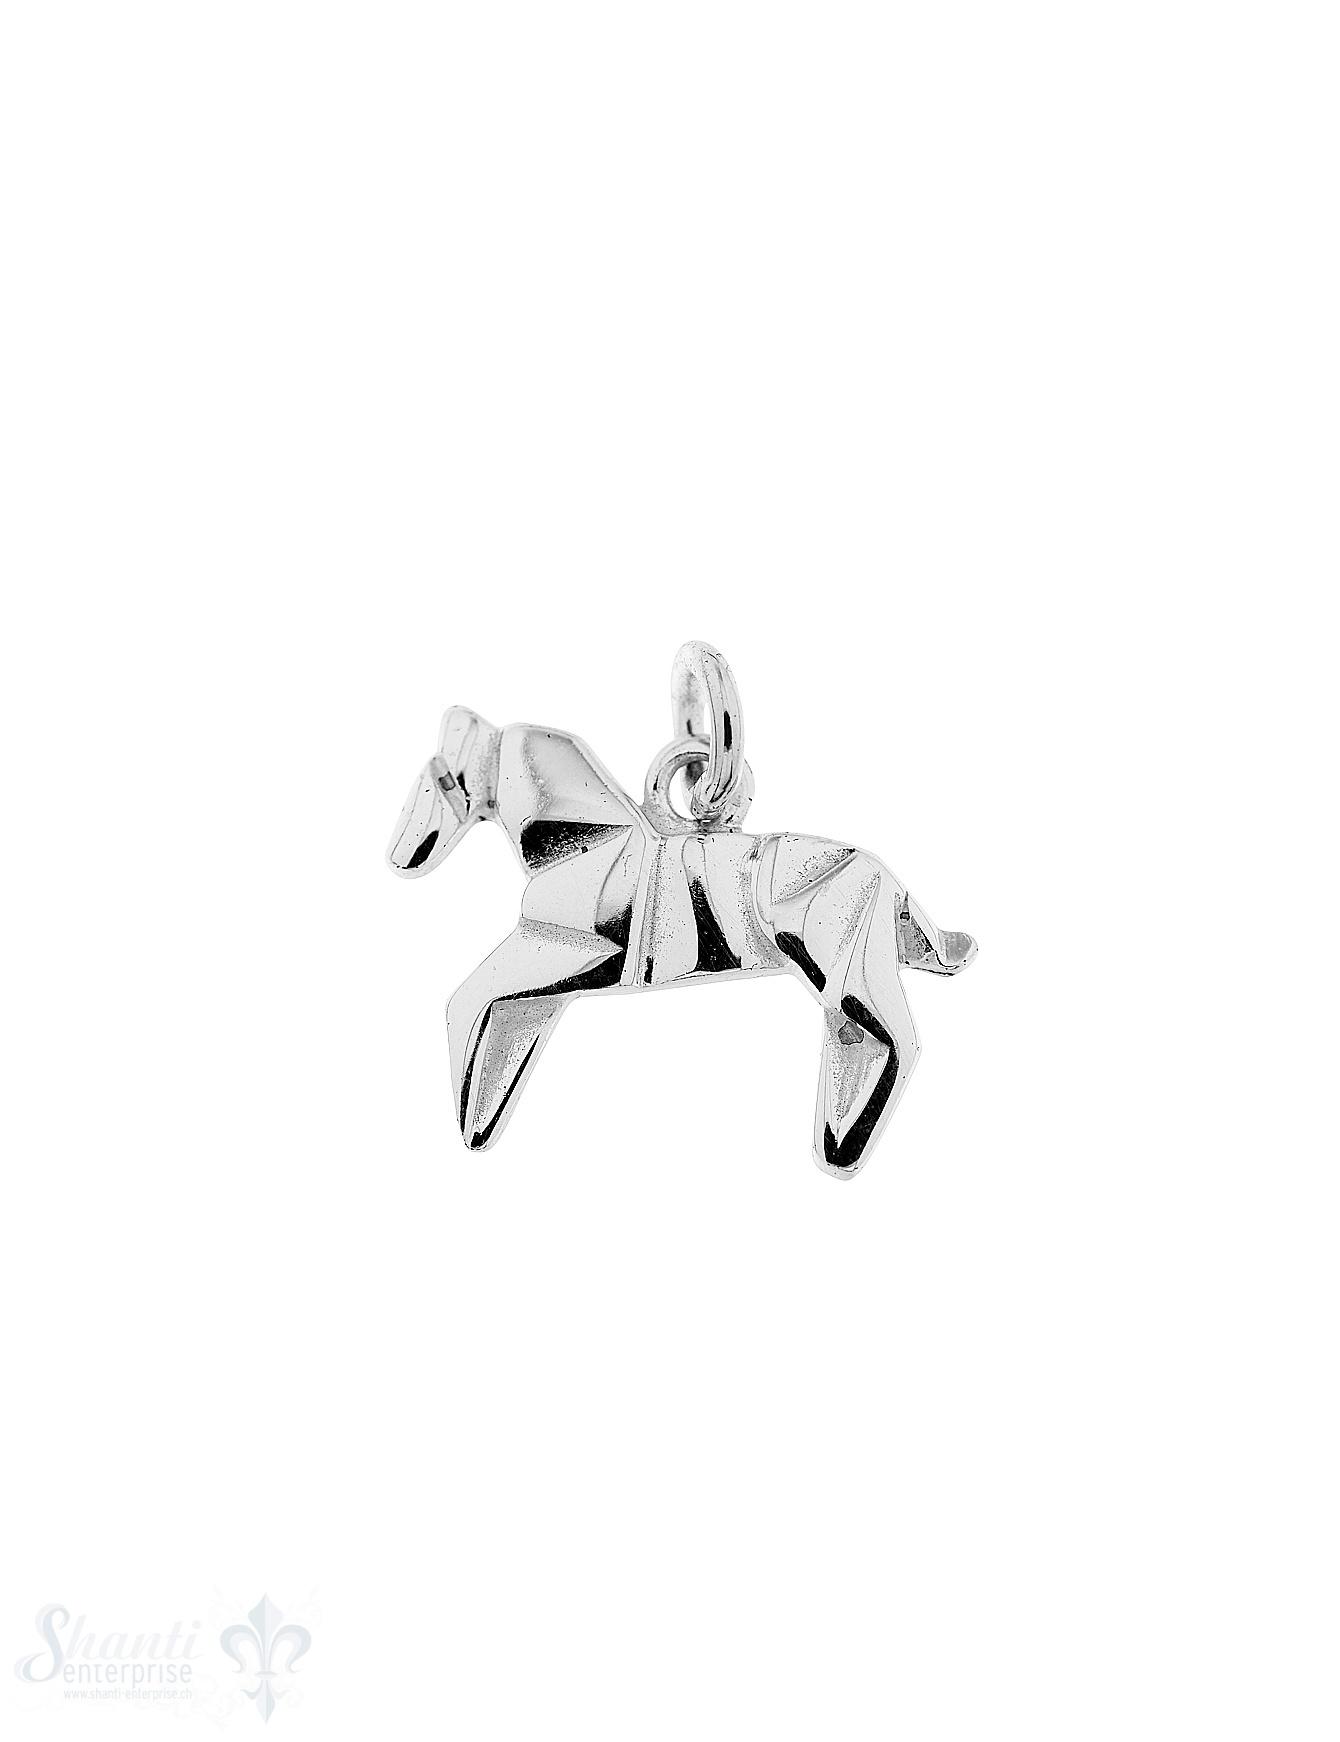 Silbertier Pferd flach 10x14 mm poliert mit Öse